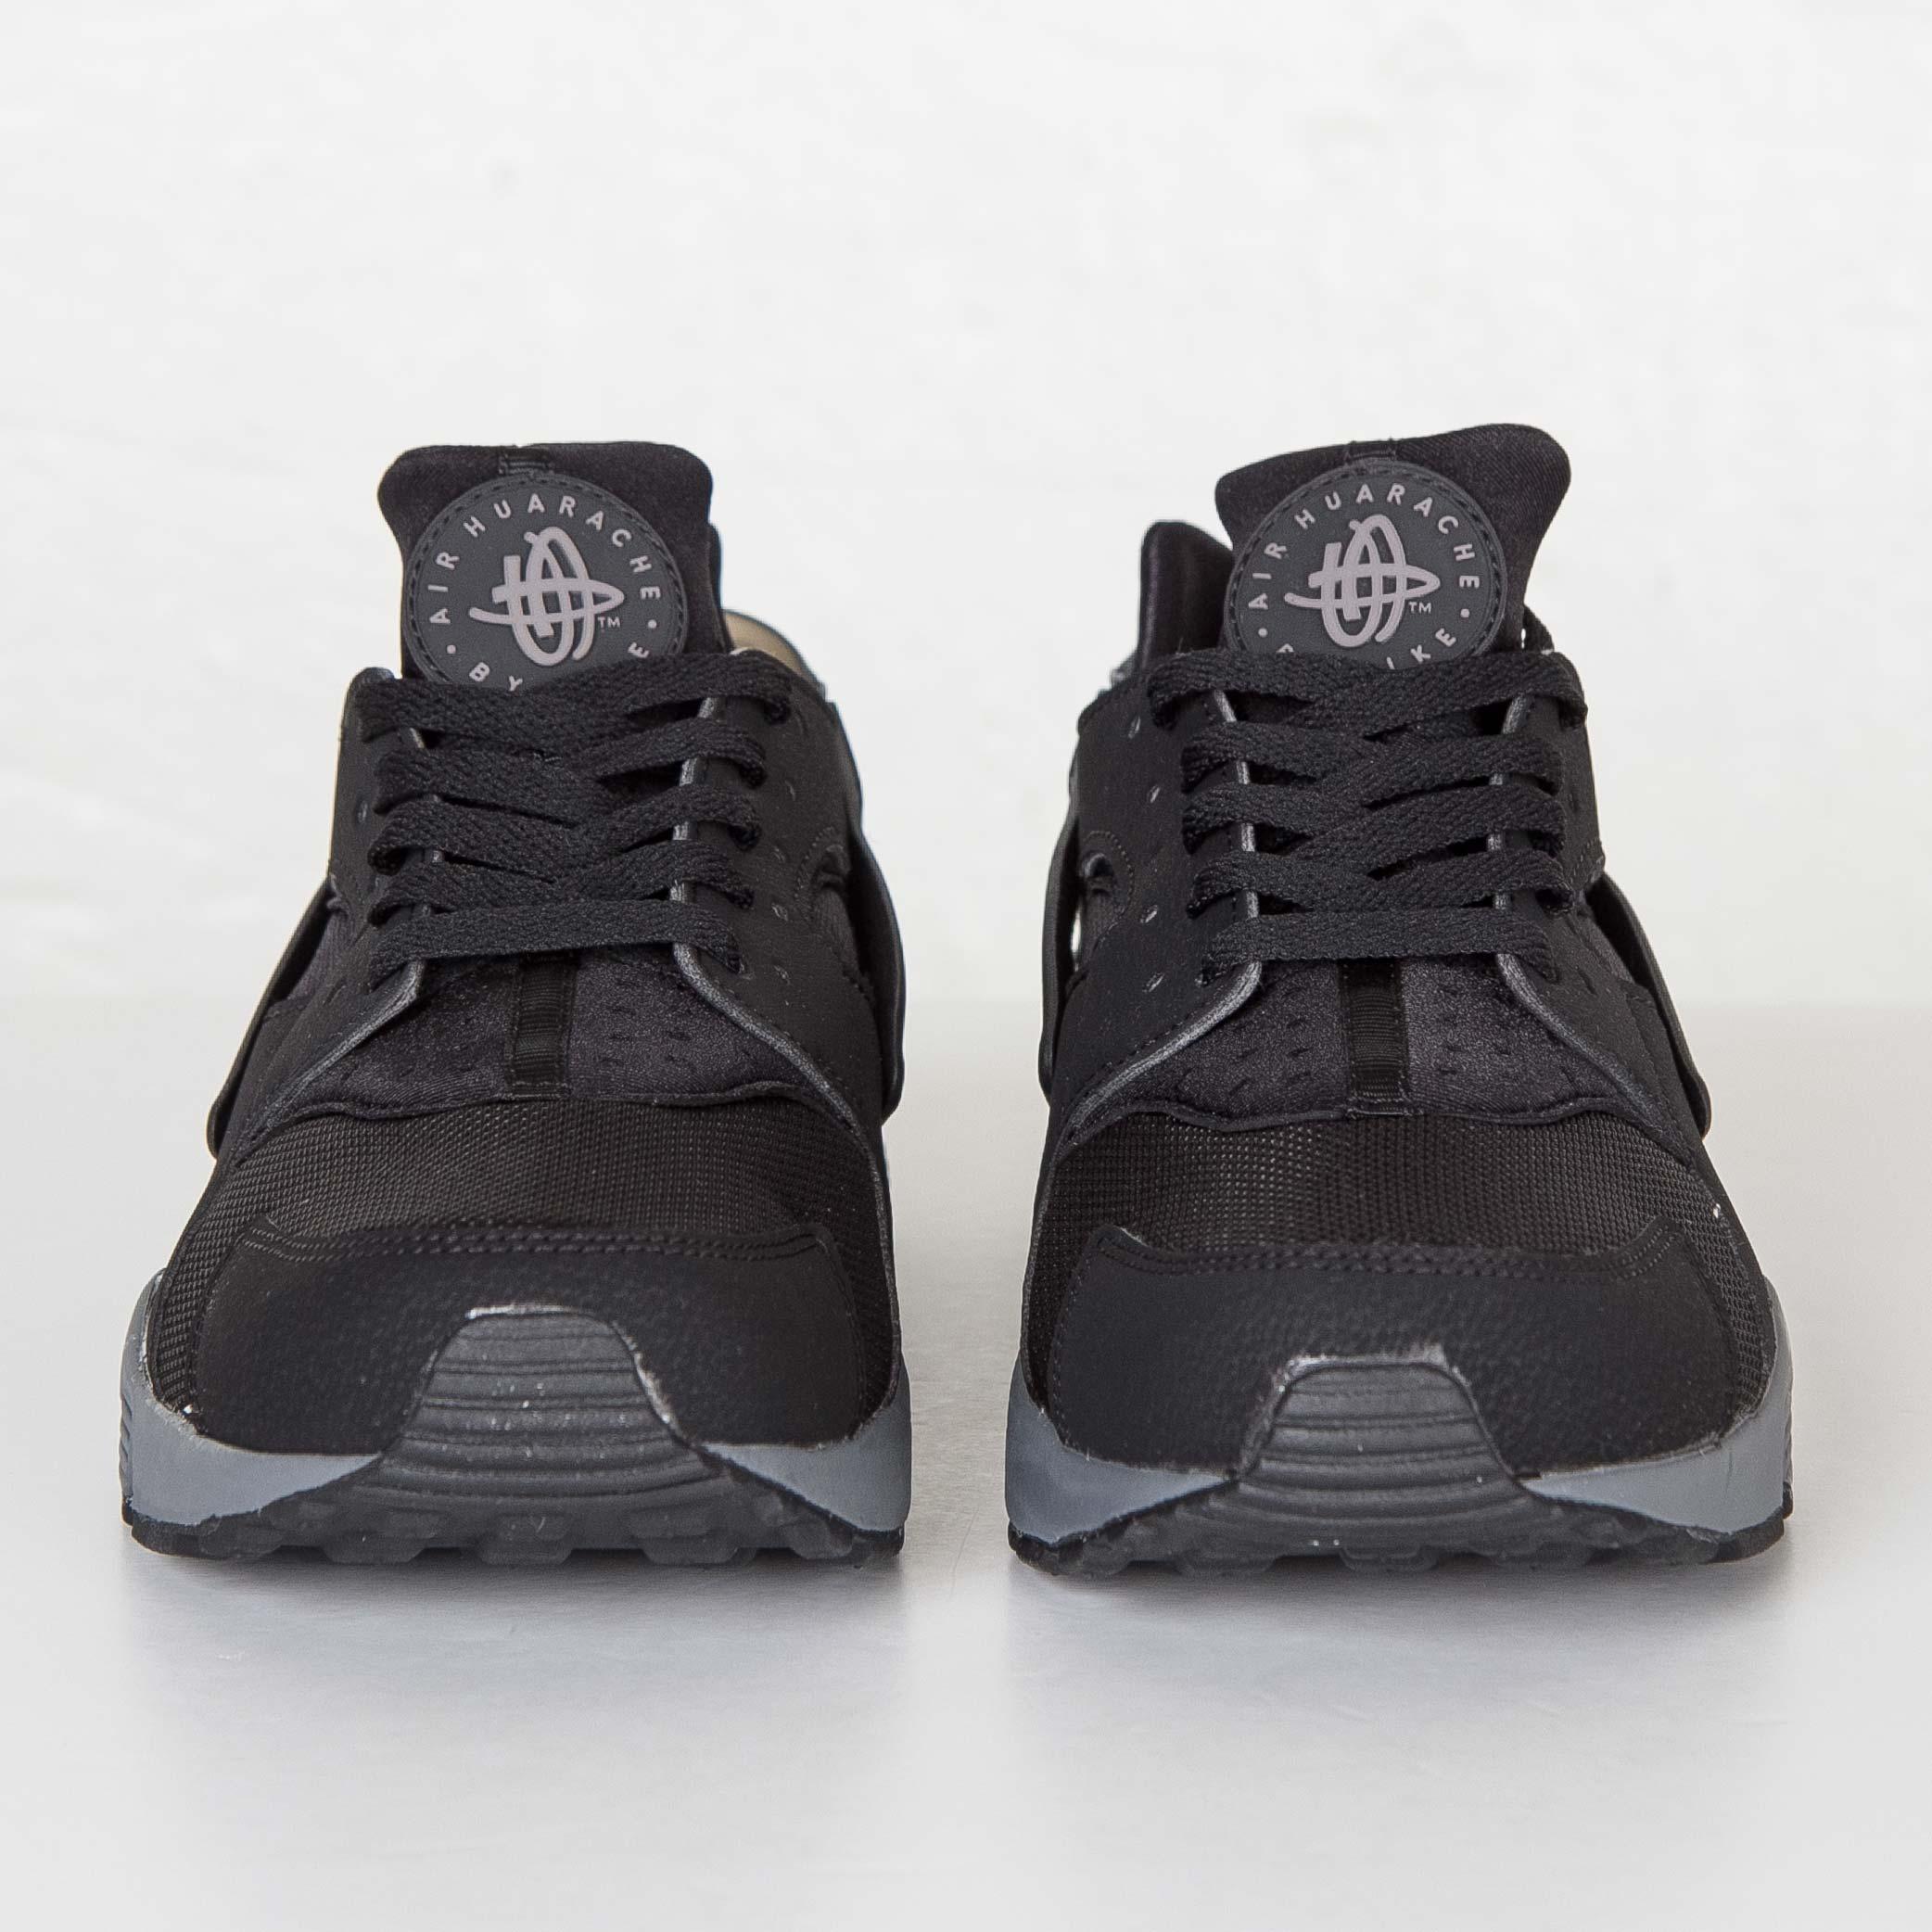 half off f0fa0 f06c6 Nike Air Huarache - 318429-010 - Sneakersnstuff   sneakers   streetwear  online since 1999